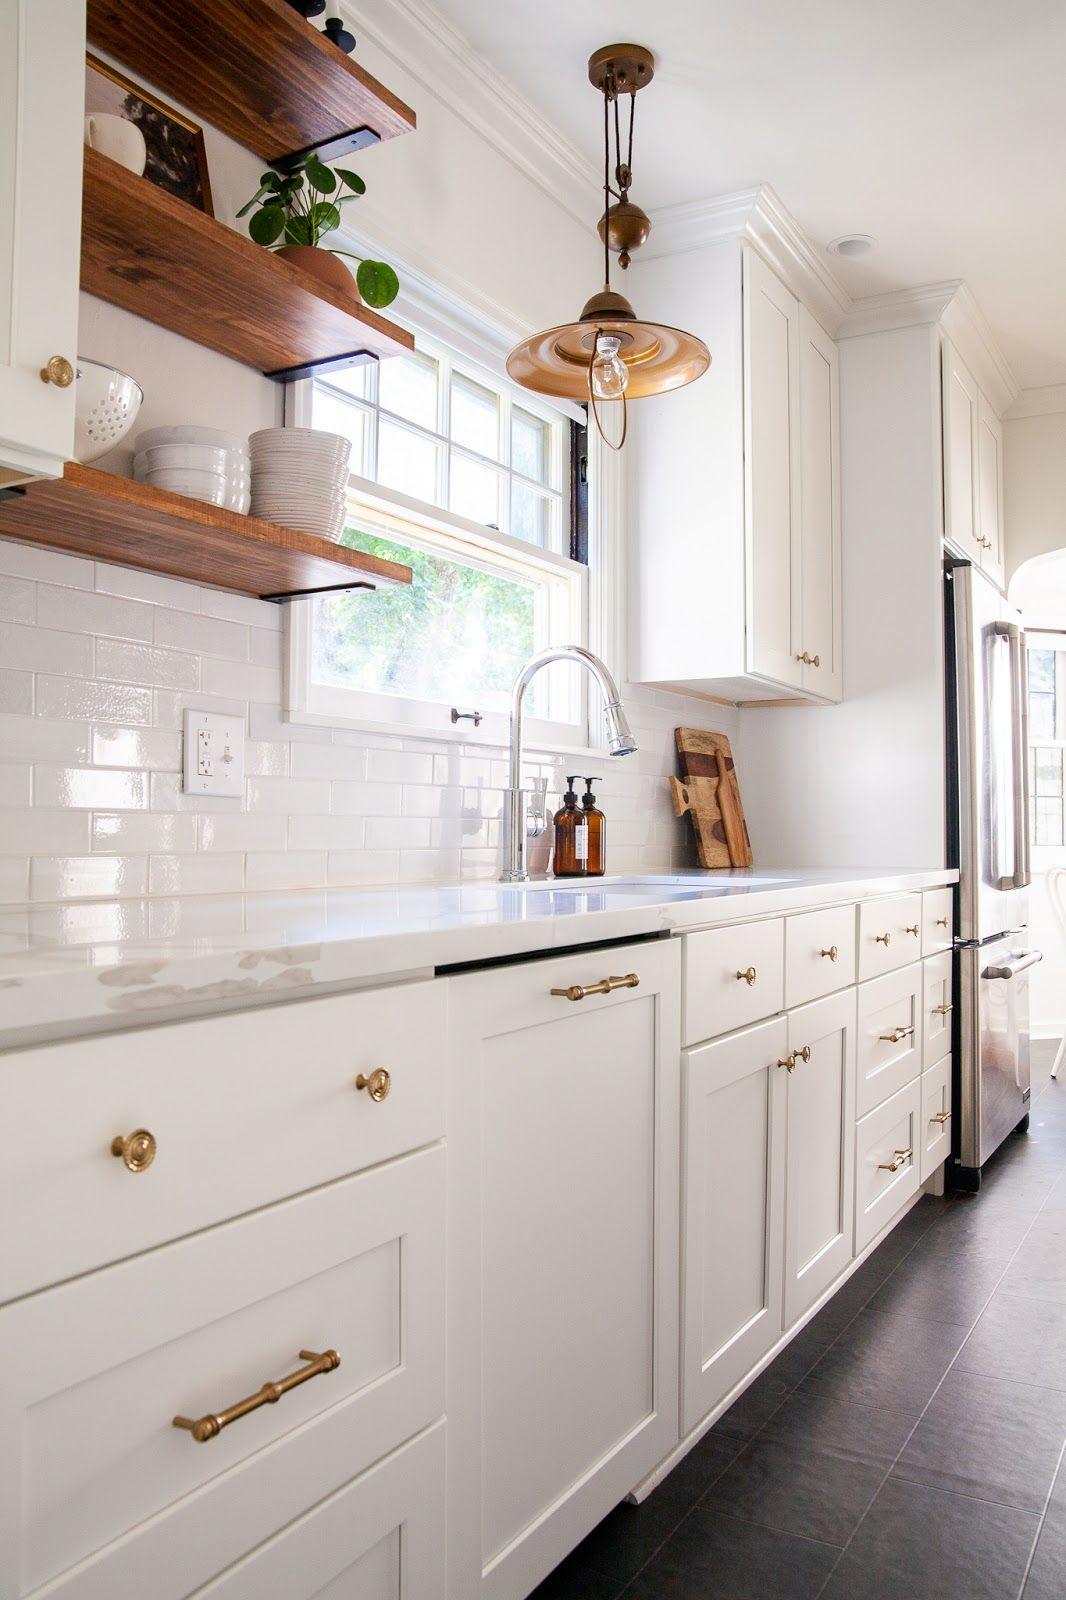 Modern Traditional Diy Kitchen Reno Reveal Affordable Kitchen Cabinets Kitchen Decor Inspiration Diy Kitchen Renovation